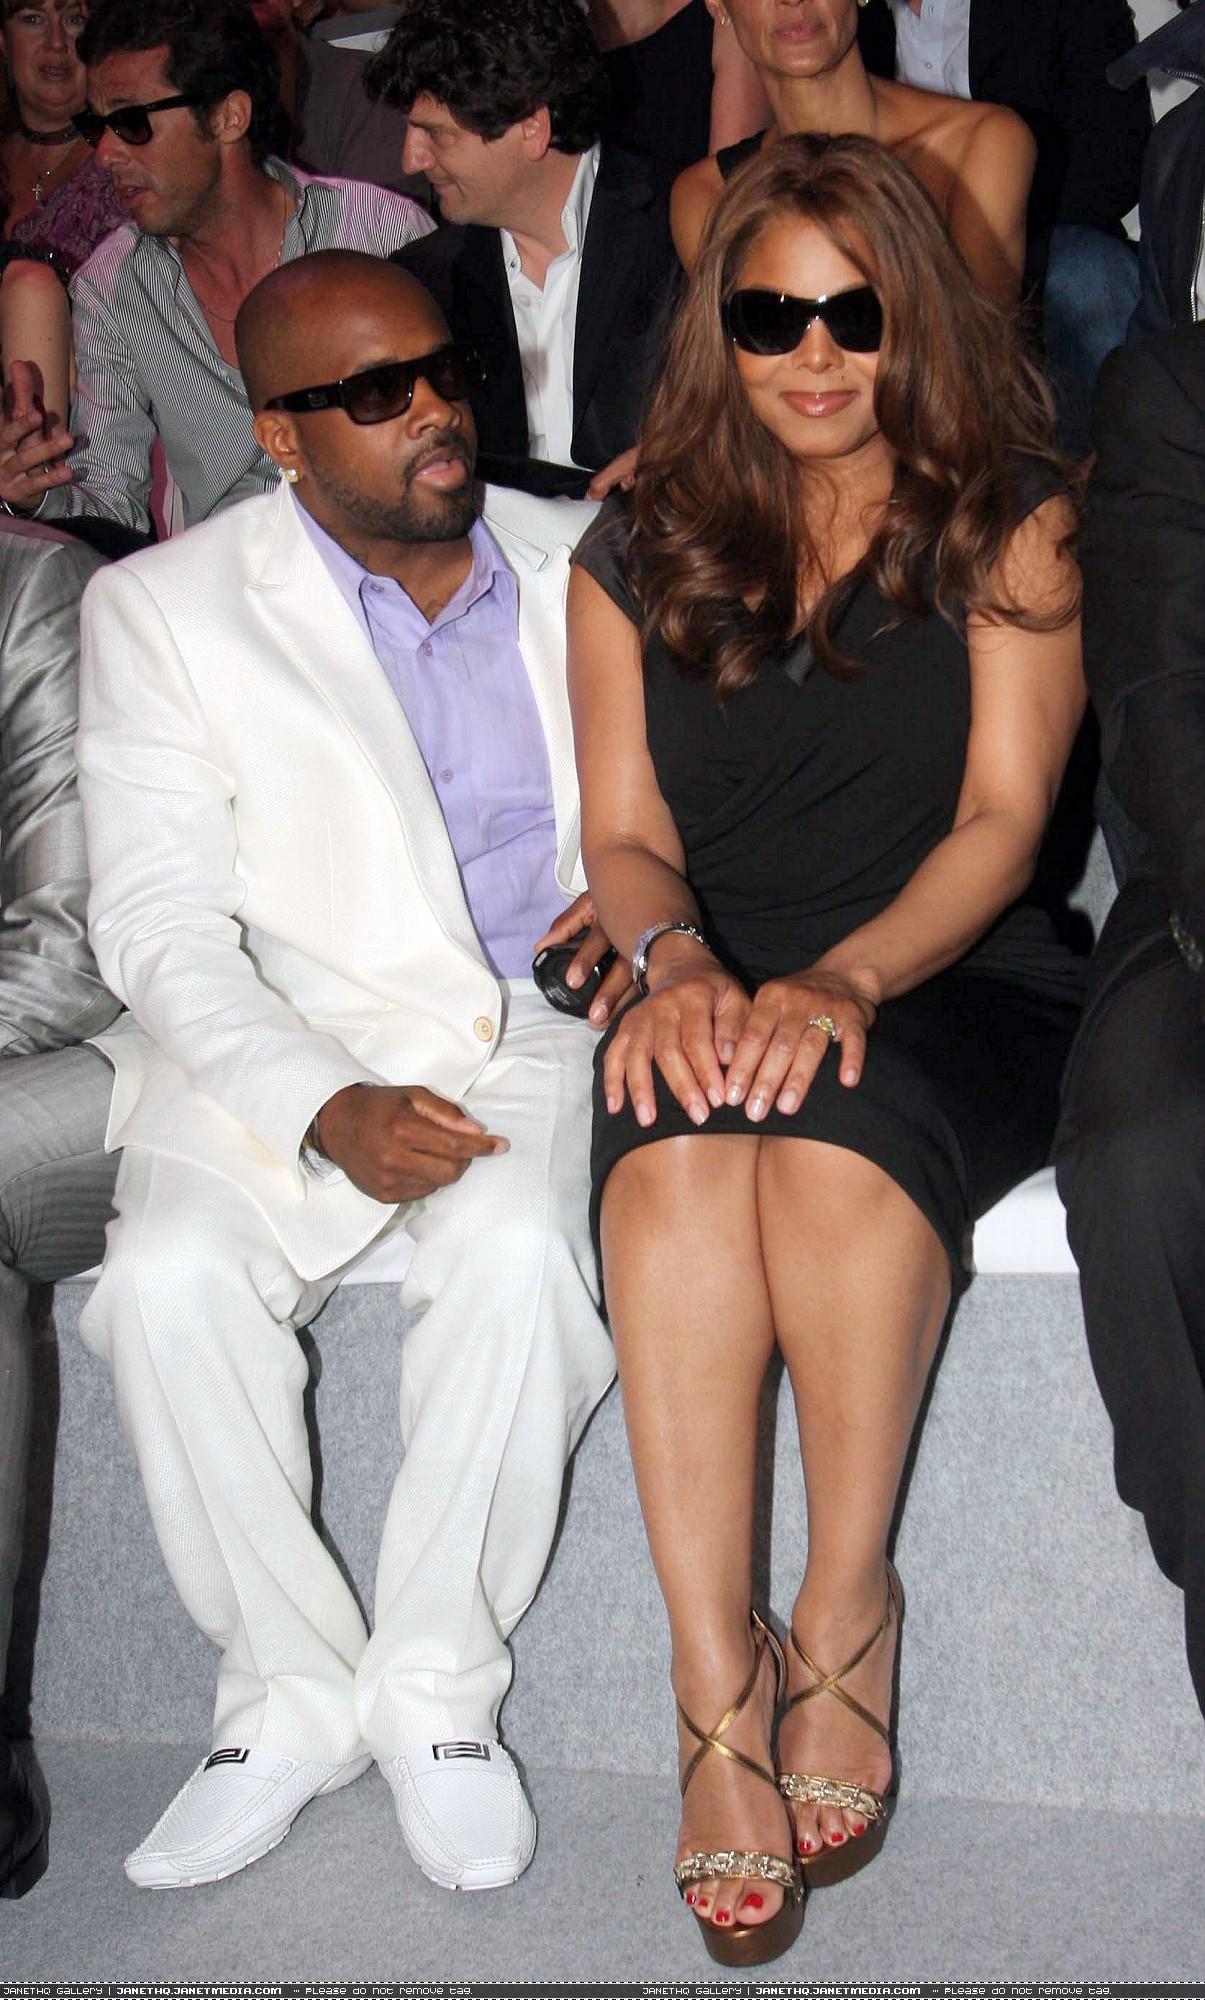 Janet Jackson's Feet